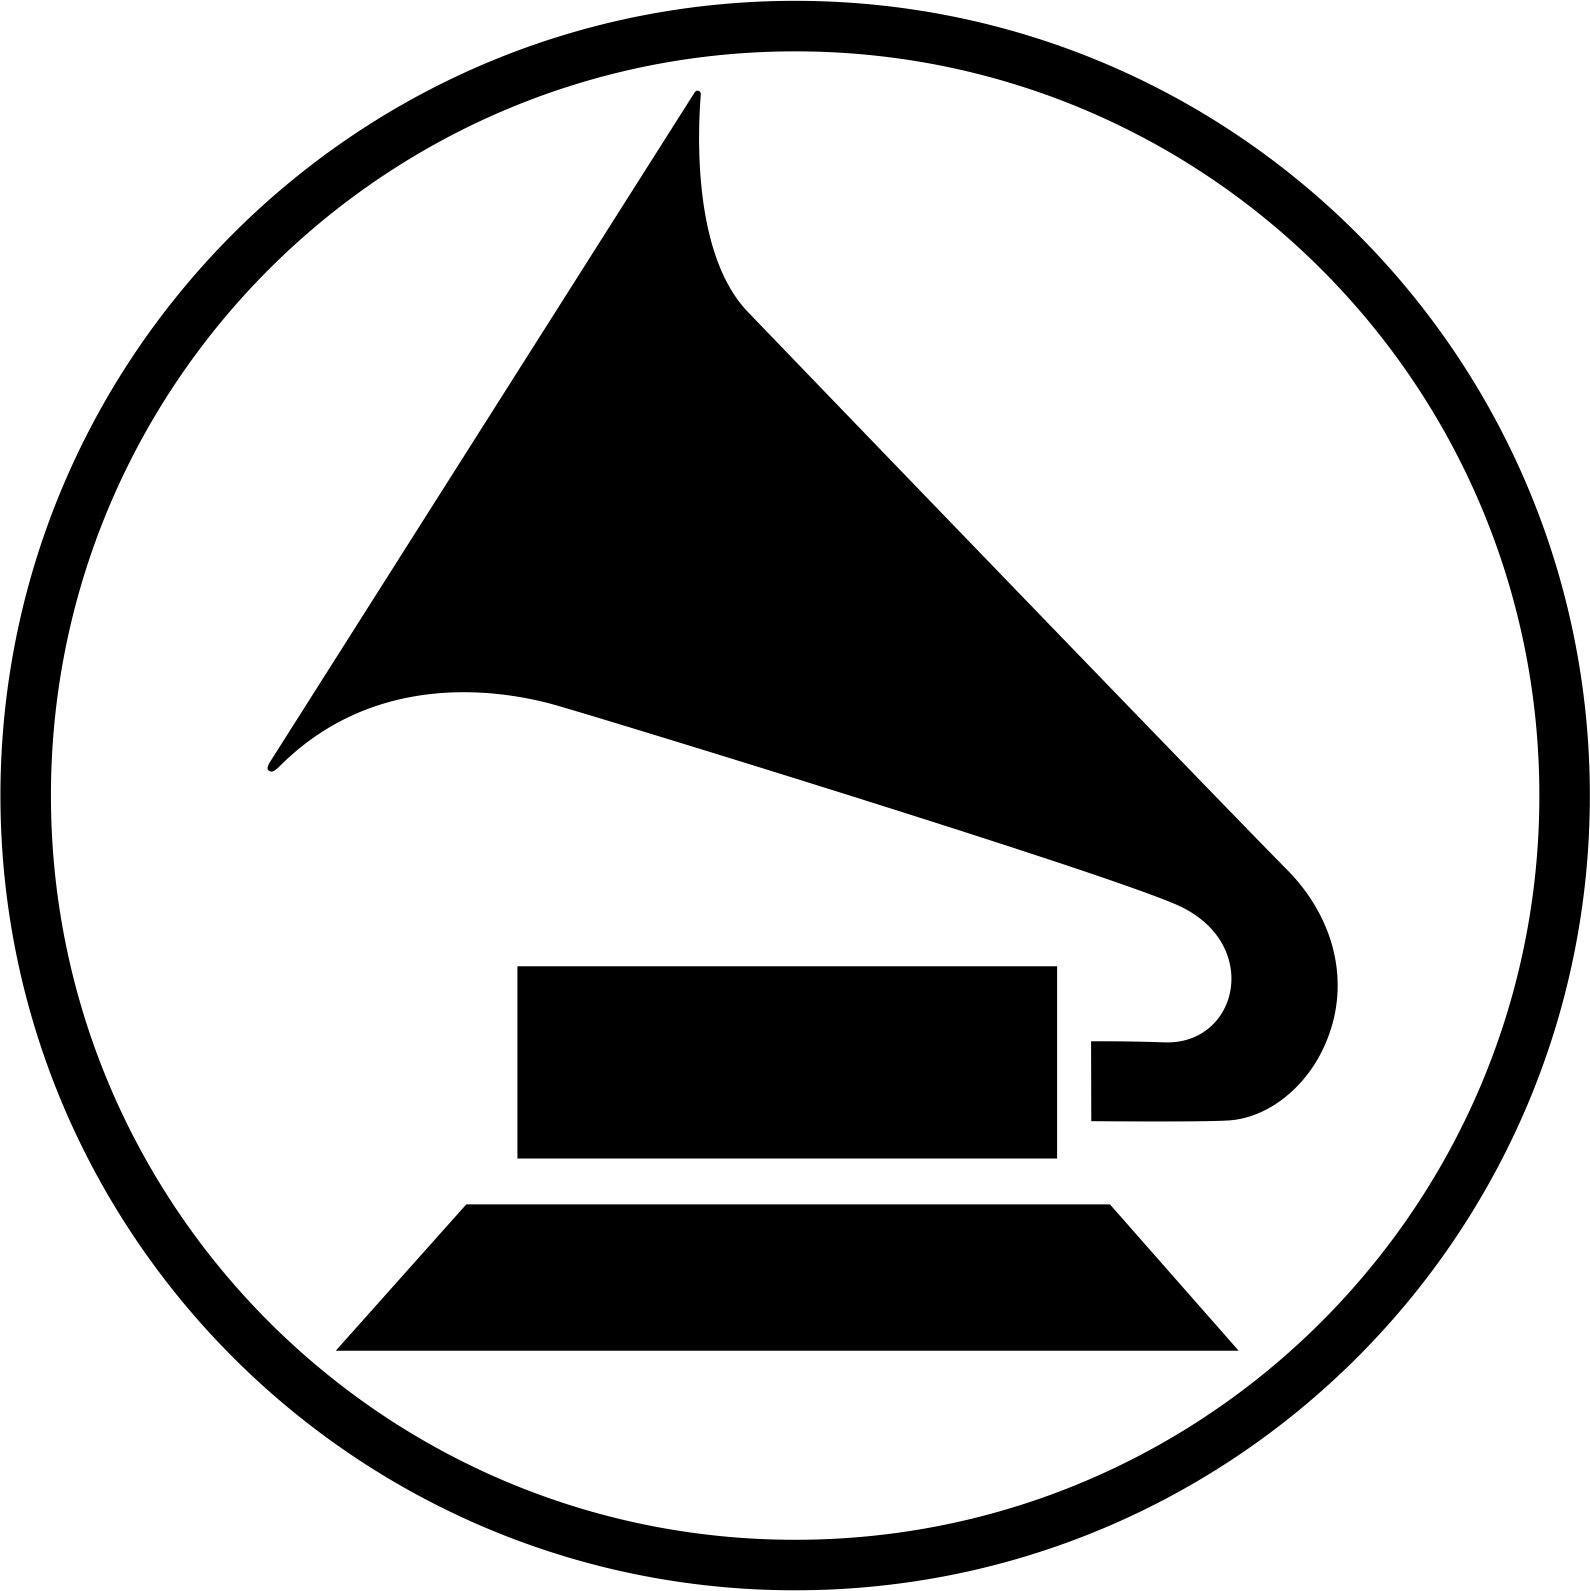 Gramophone Vector Art CDR File